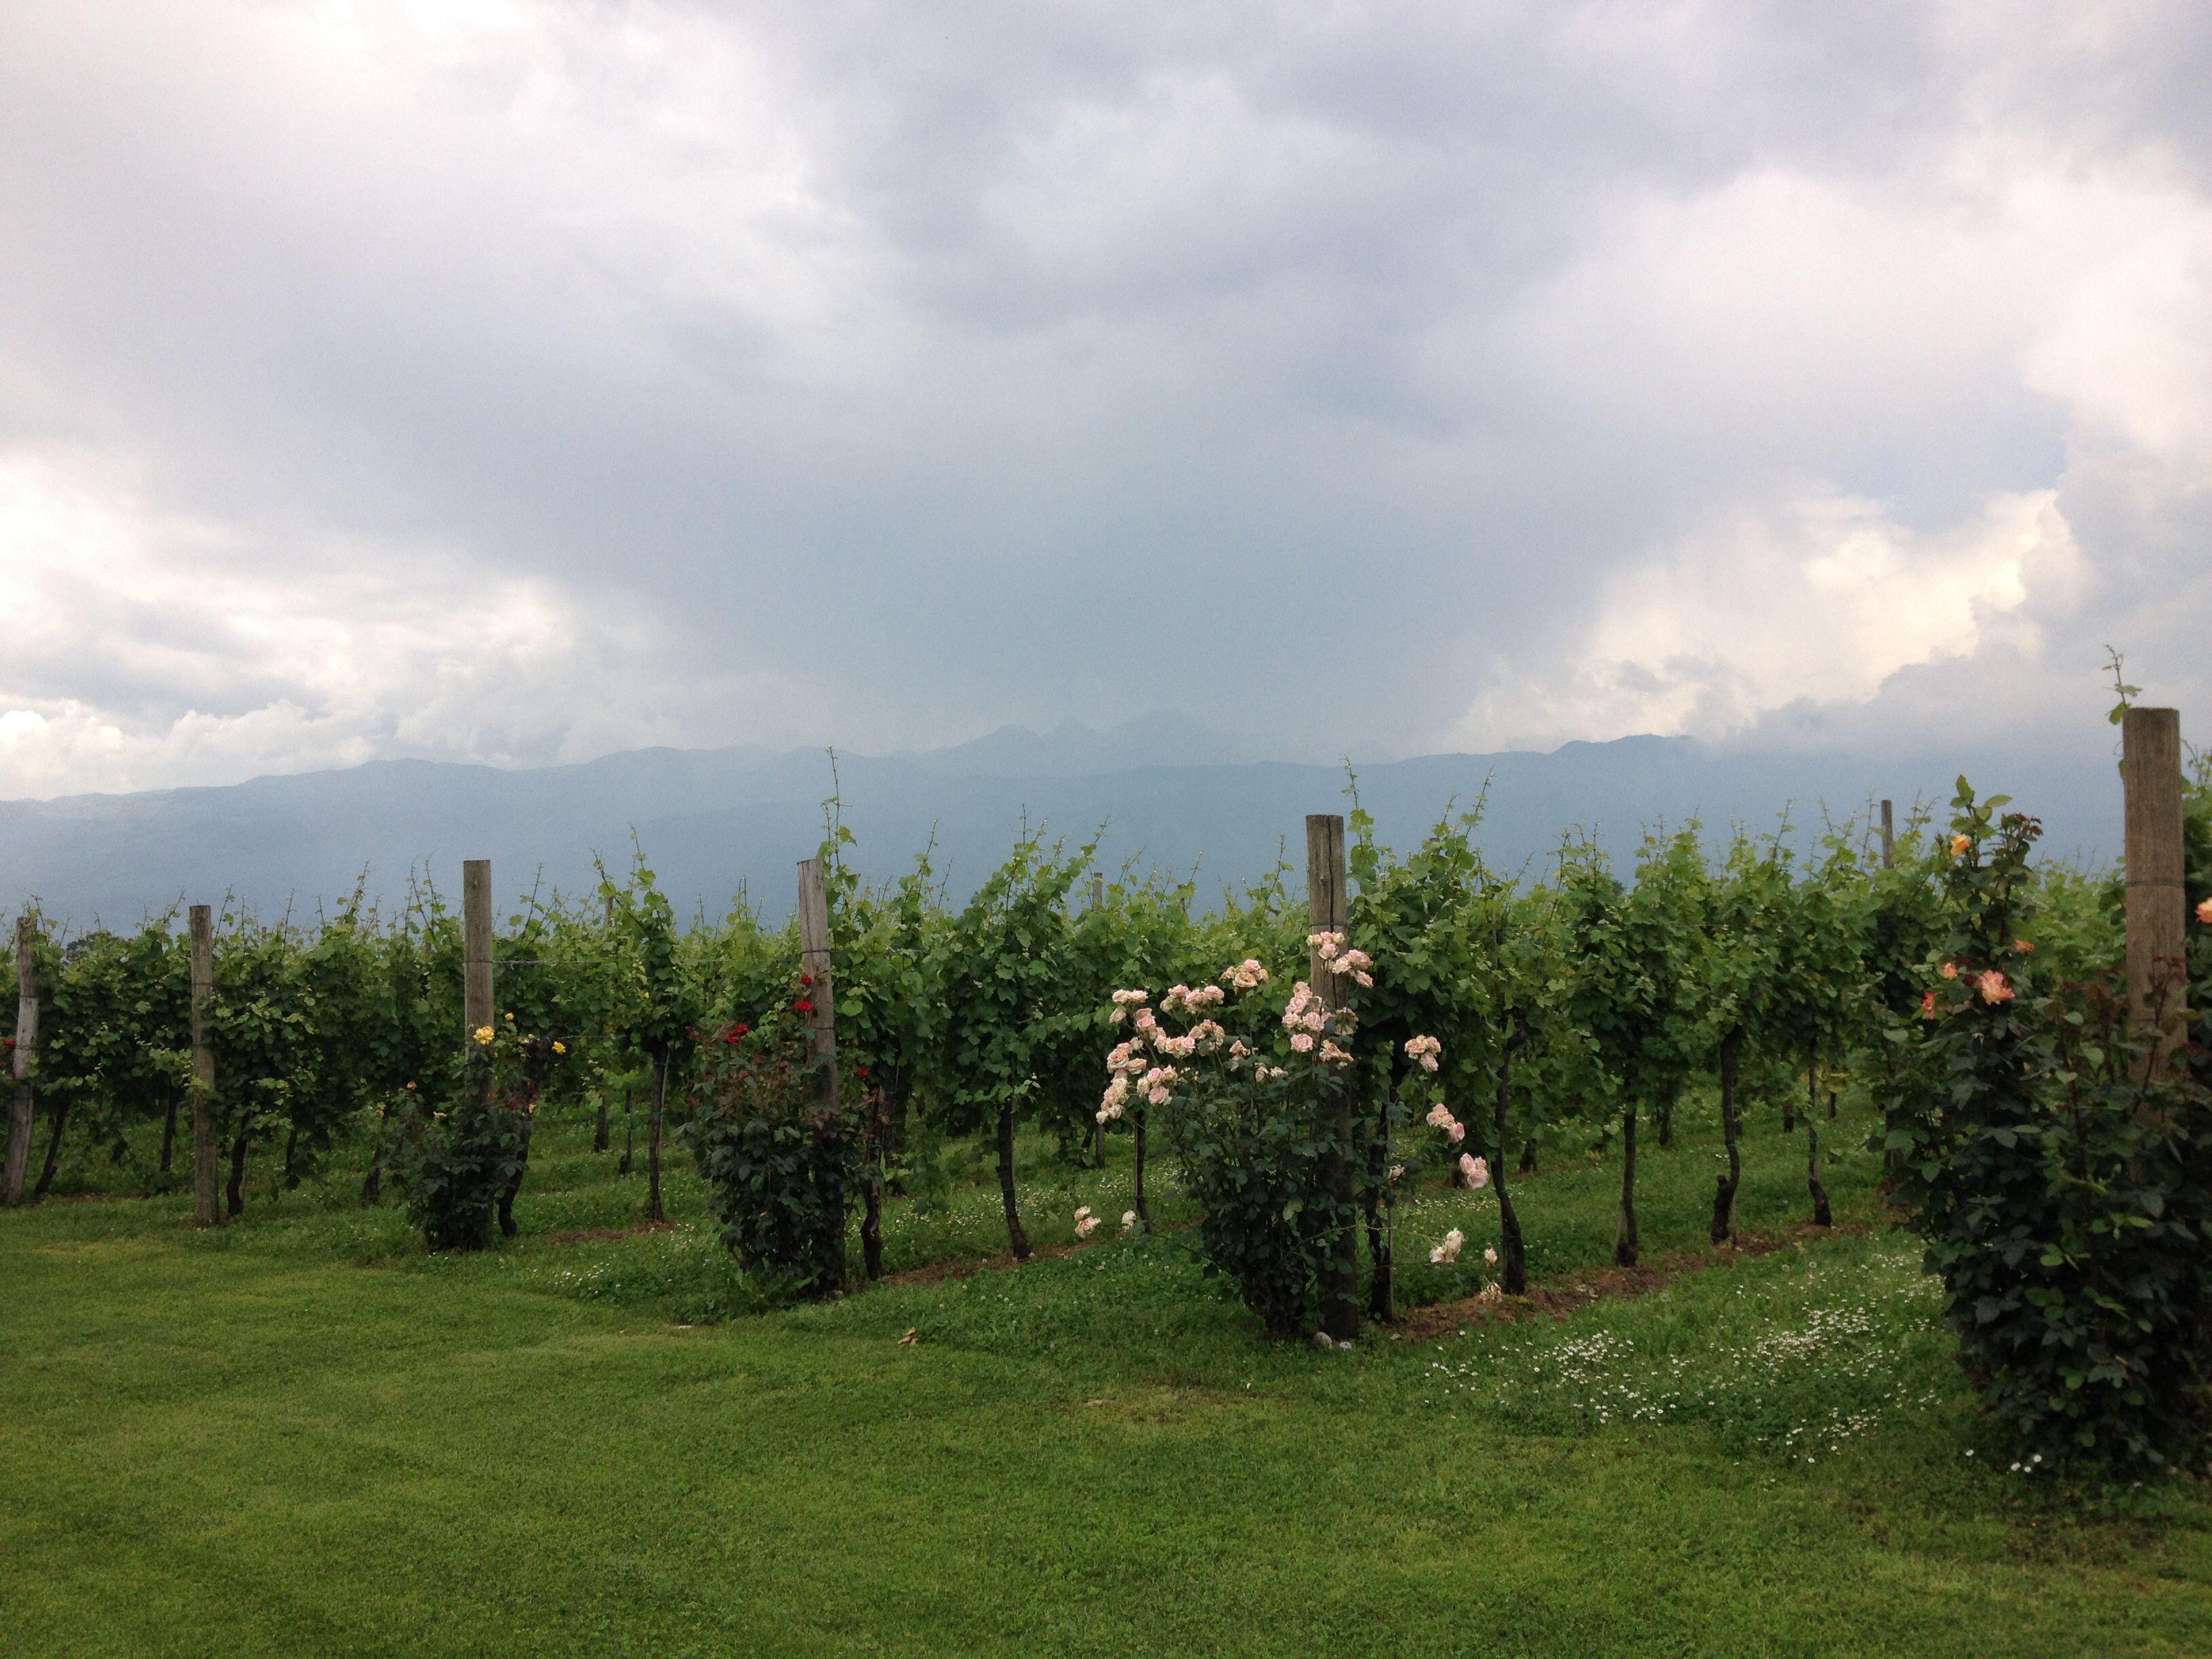 Wine Vineyard Near The Mountains In Aviano Italy Wine